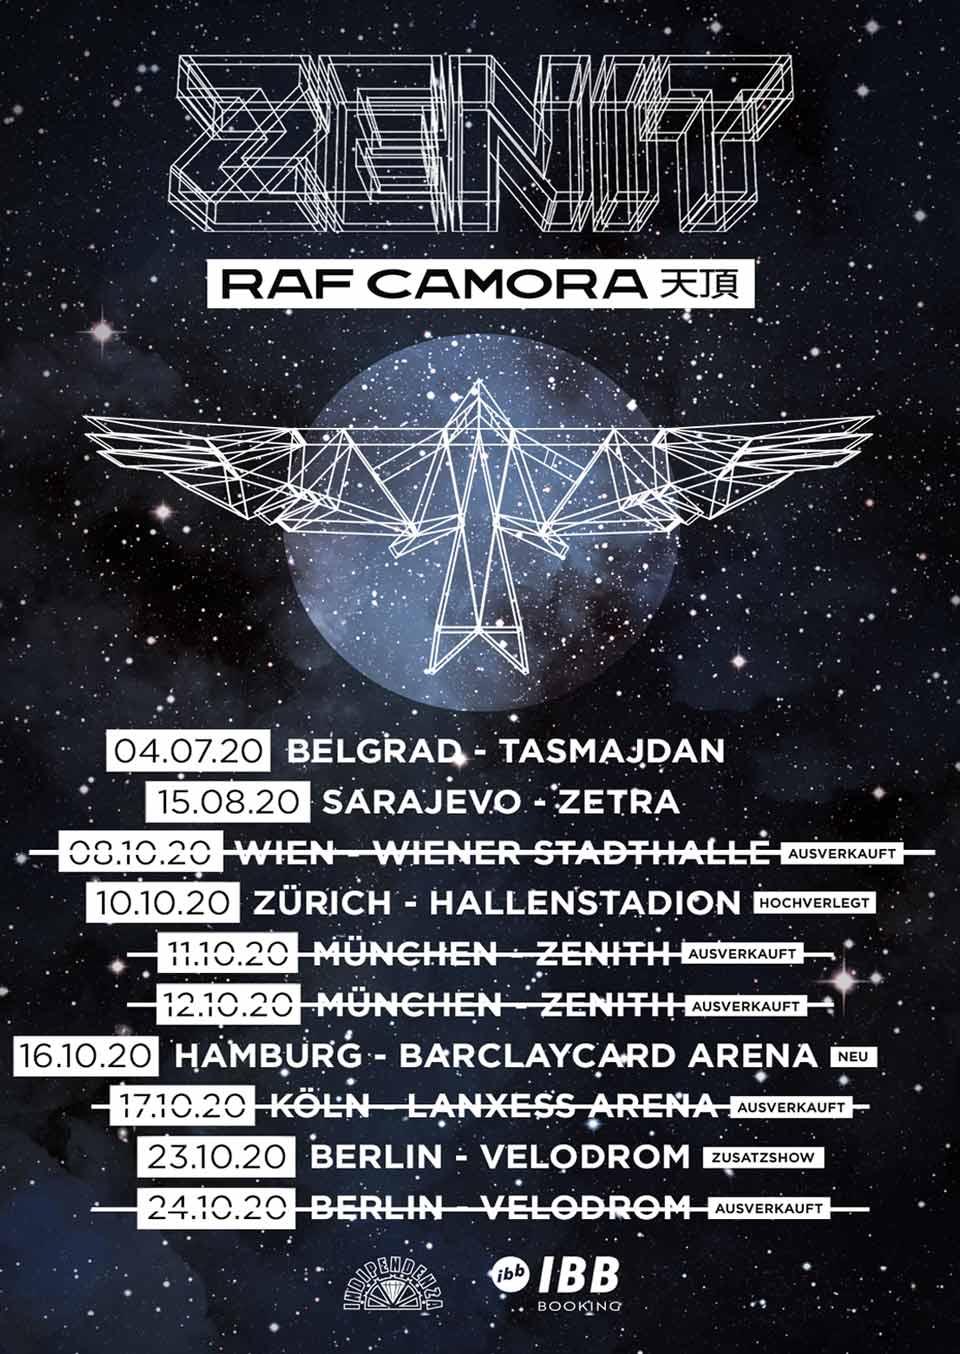 Raf Camora IBB Booking Agentur GmbH